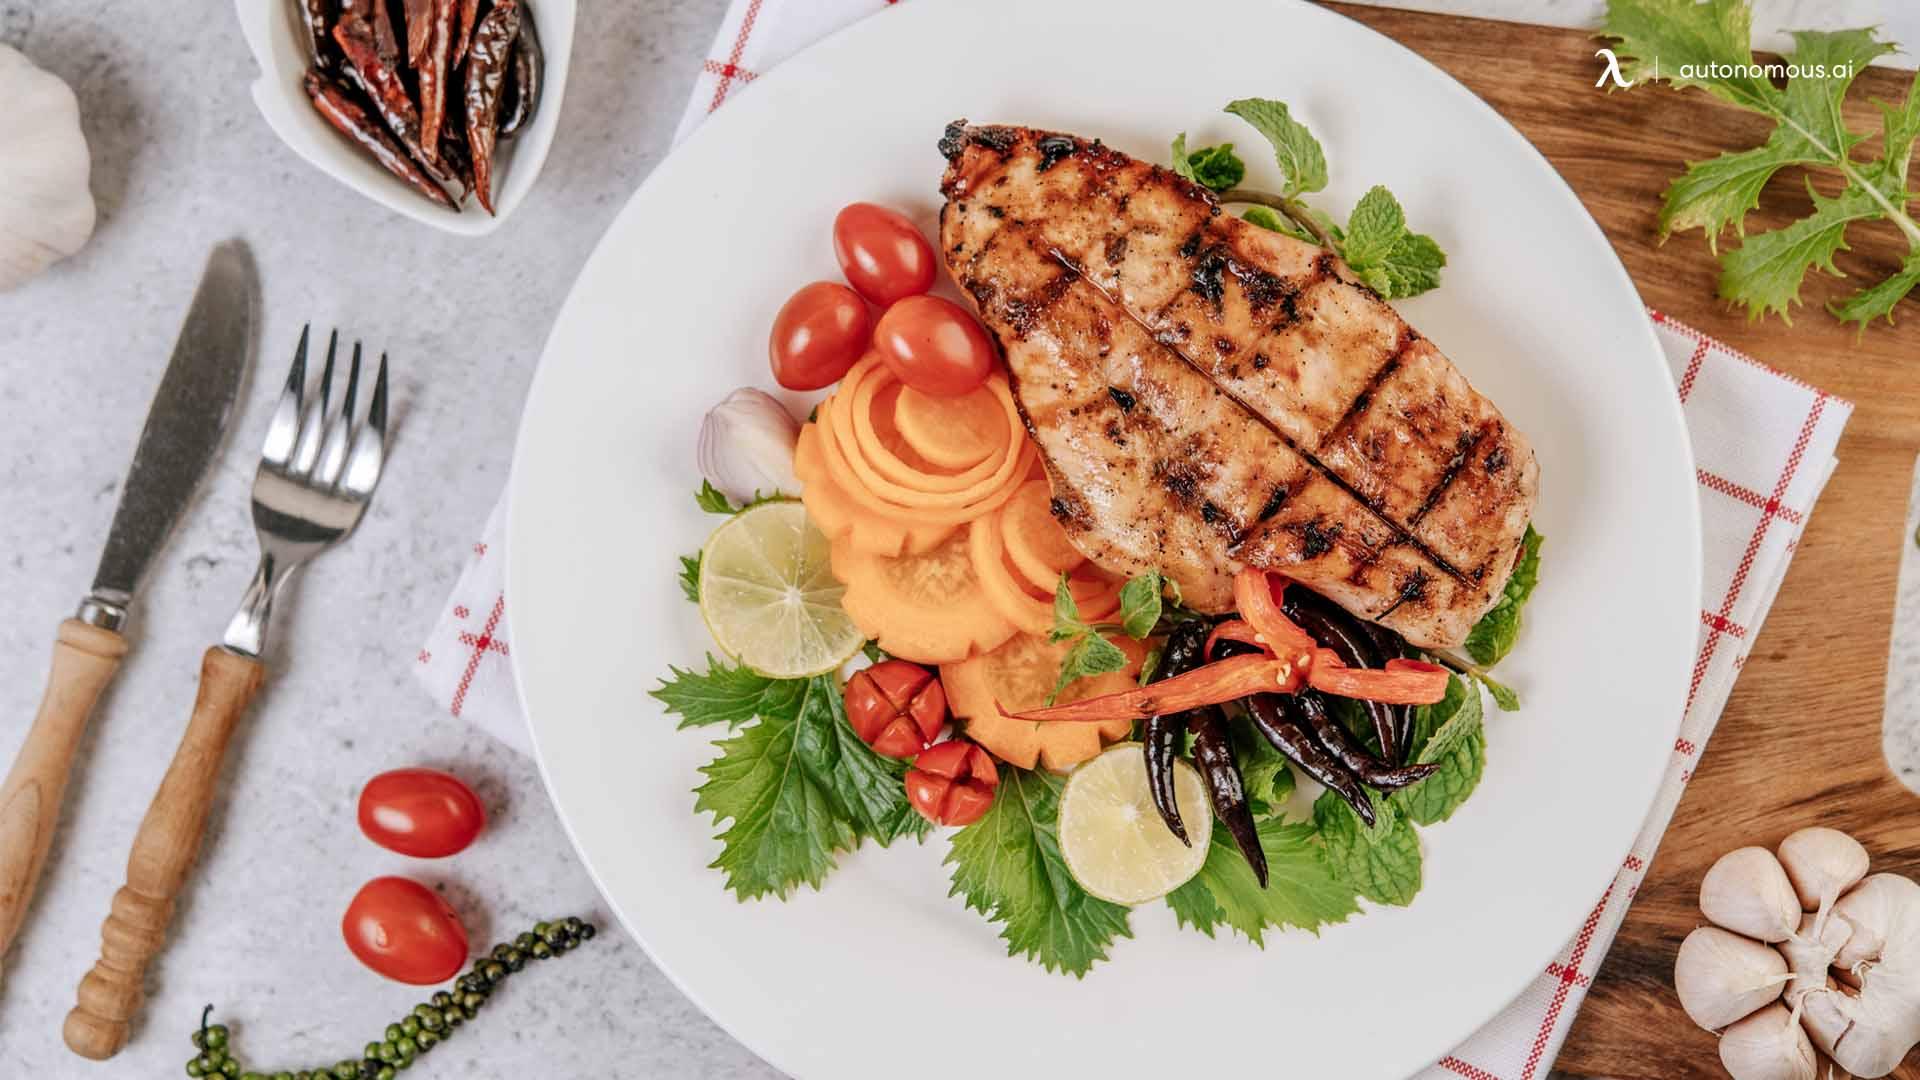 Tip 2 - Eat a Healthy Diet